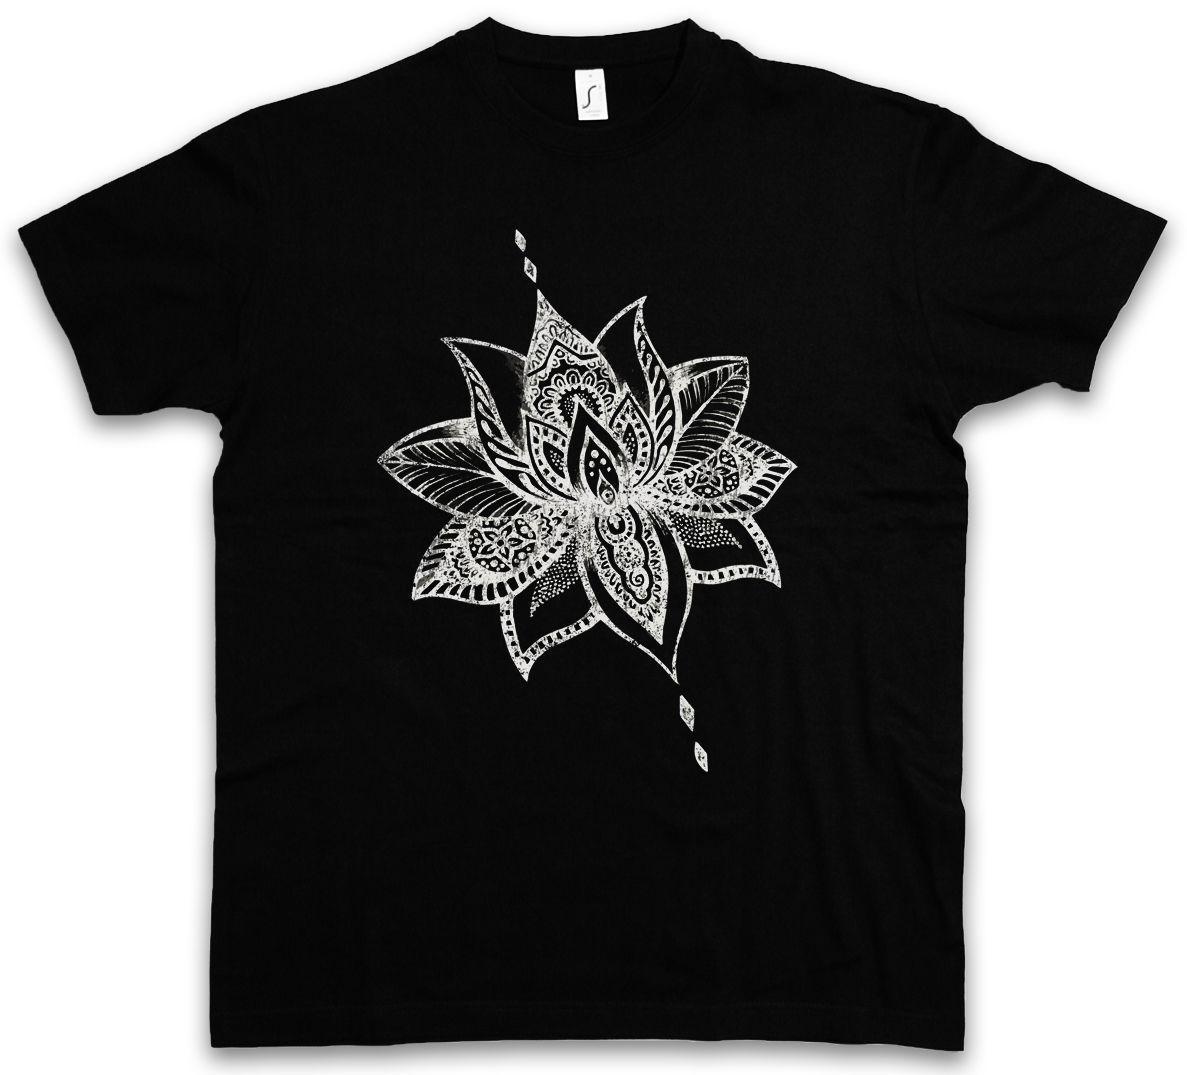 TATTOO FLOWER T-SHIRT Plantas Art Tattooist Studio Artista Plantas Flores